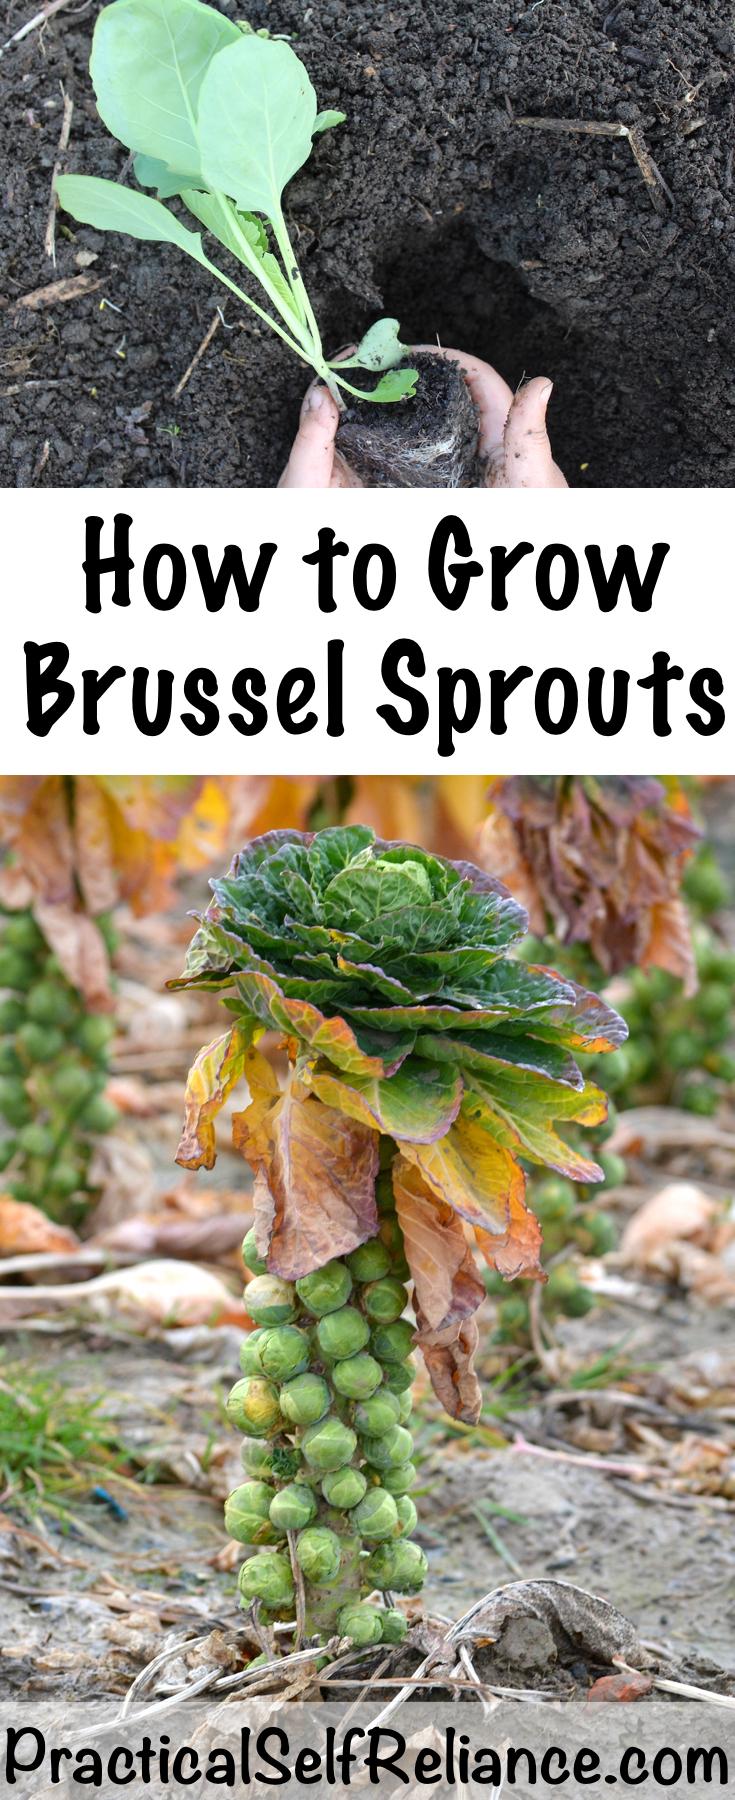 How to Grow Brussel Sprouts ~ In the Garden or in Containers #brusselssprouts #brusselsprouts #howtogrow #gardening #gardeningtips #organicgarden #fallgarden #containergarden